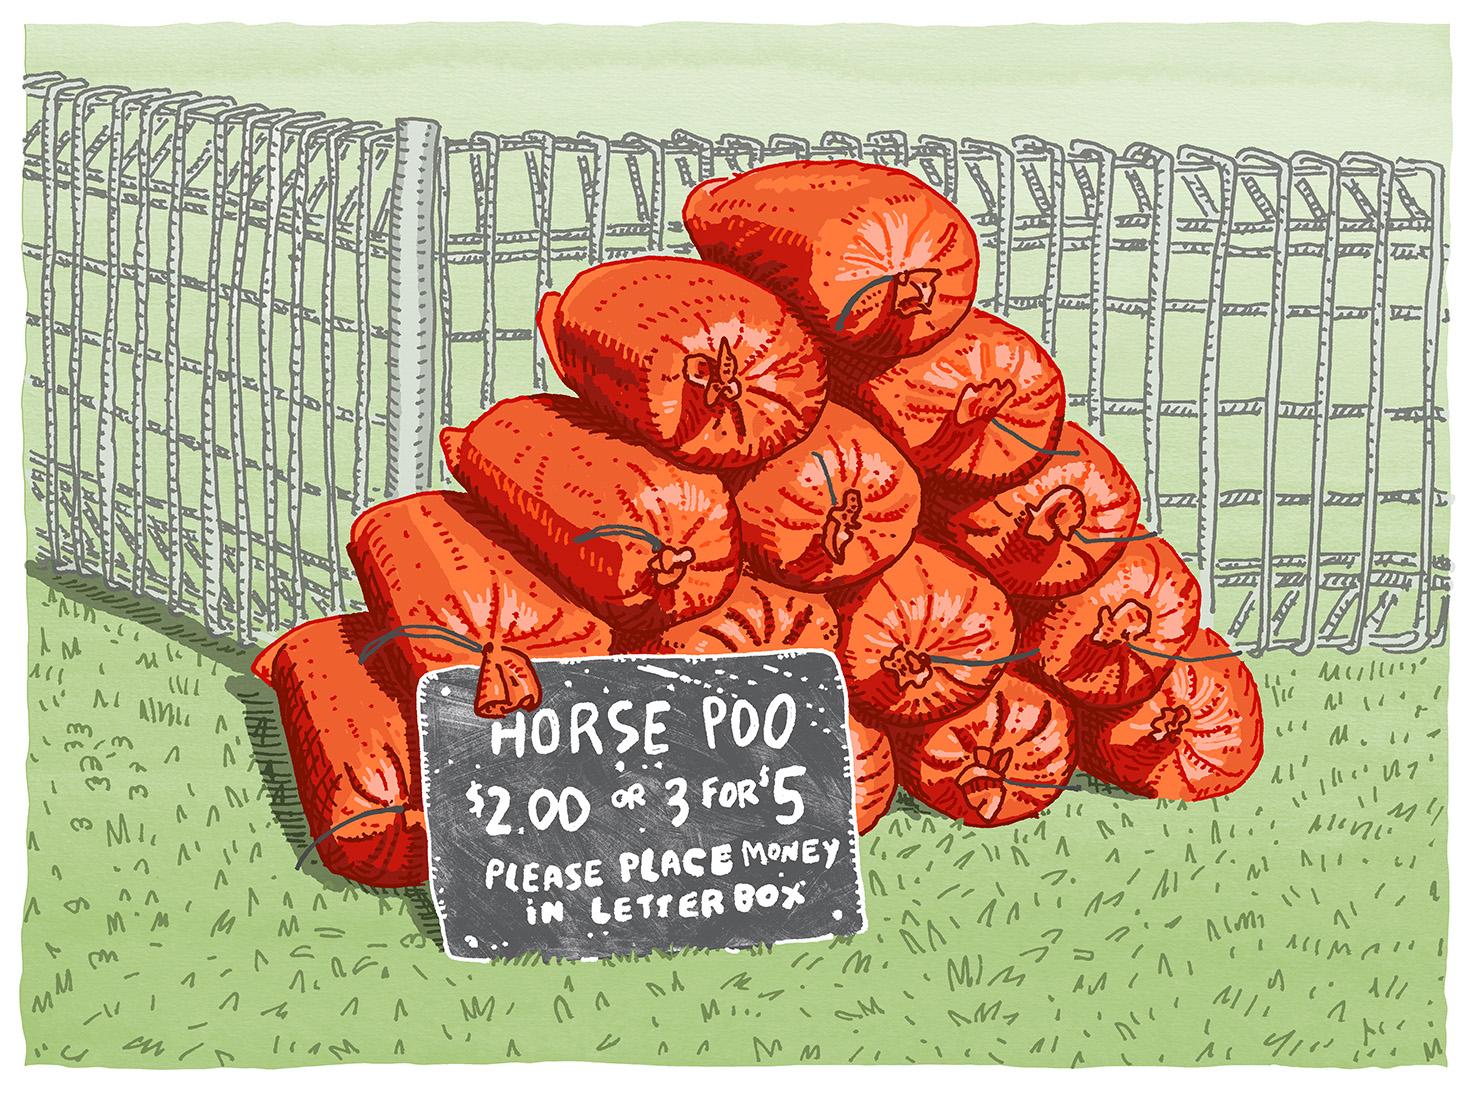 Horse poo!.jpg